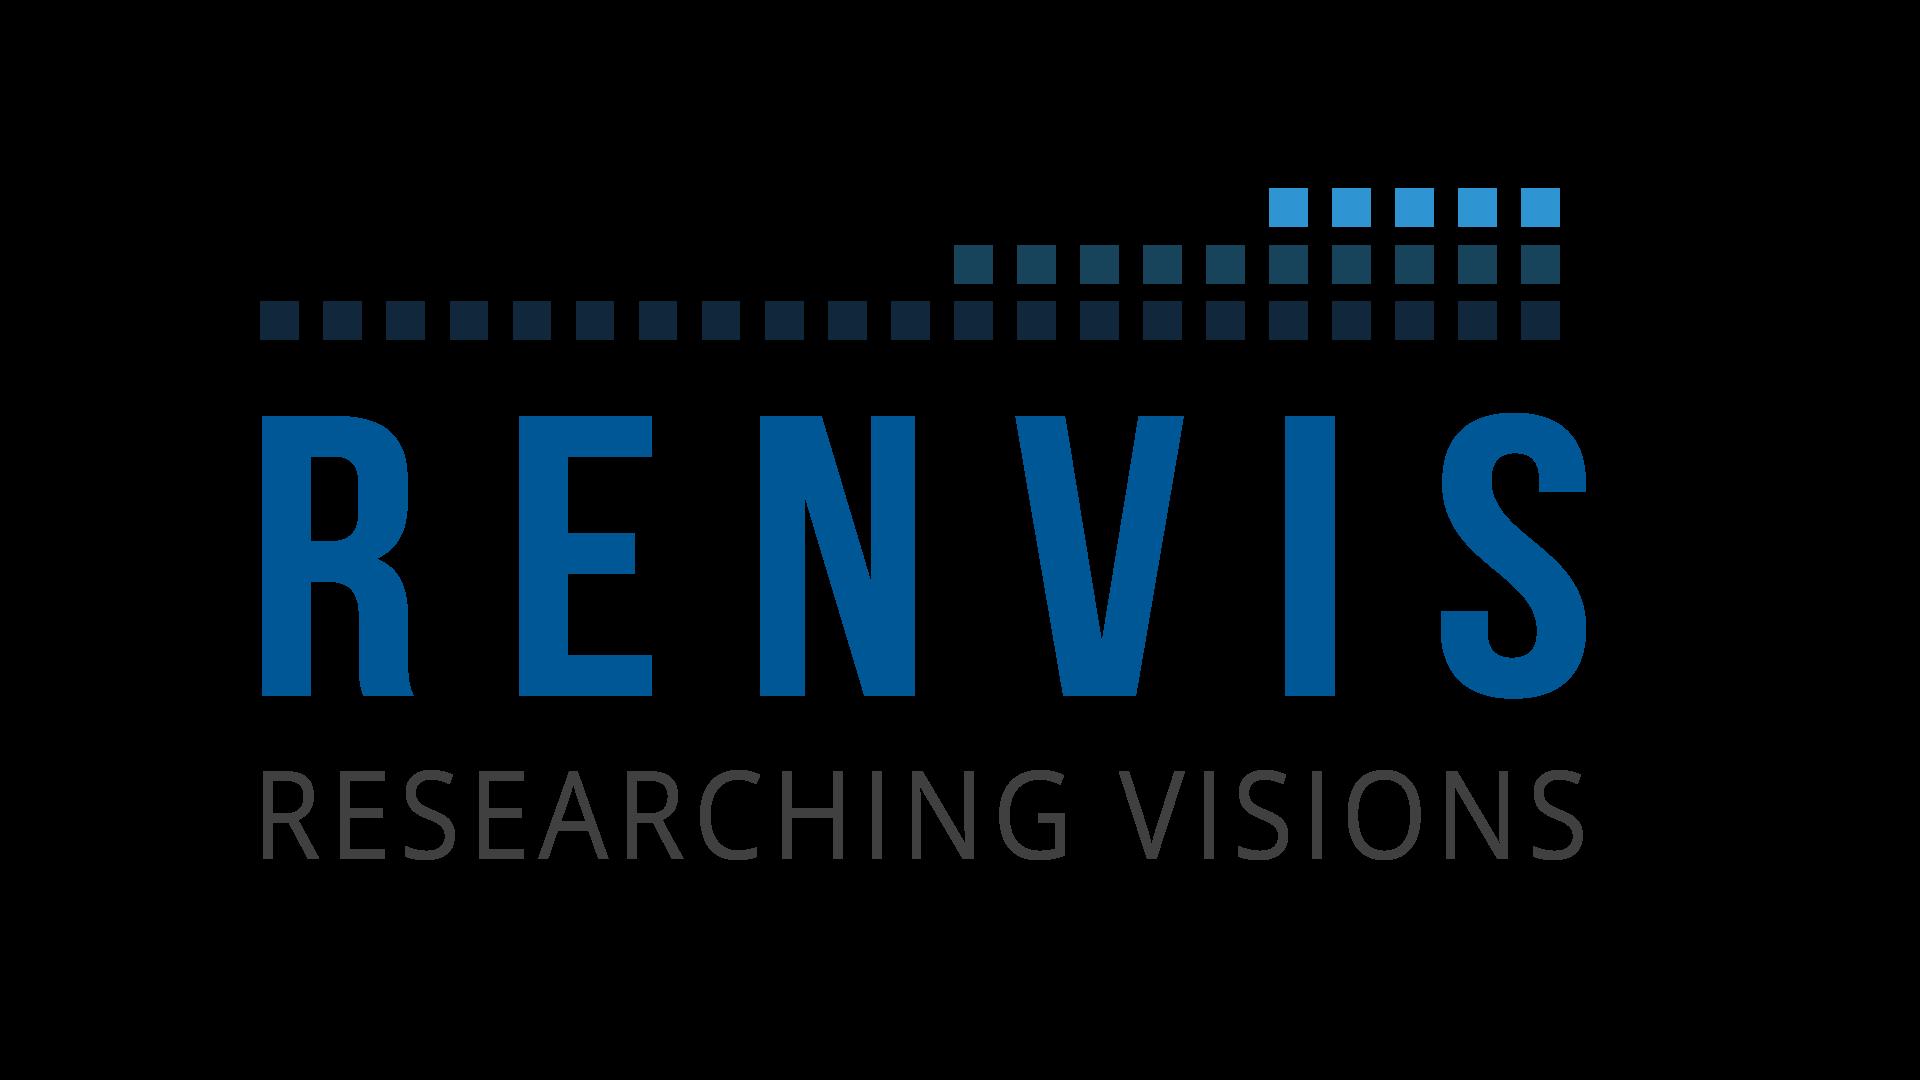 Renvis - Logo